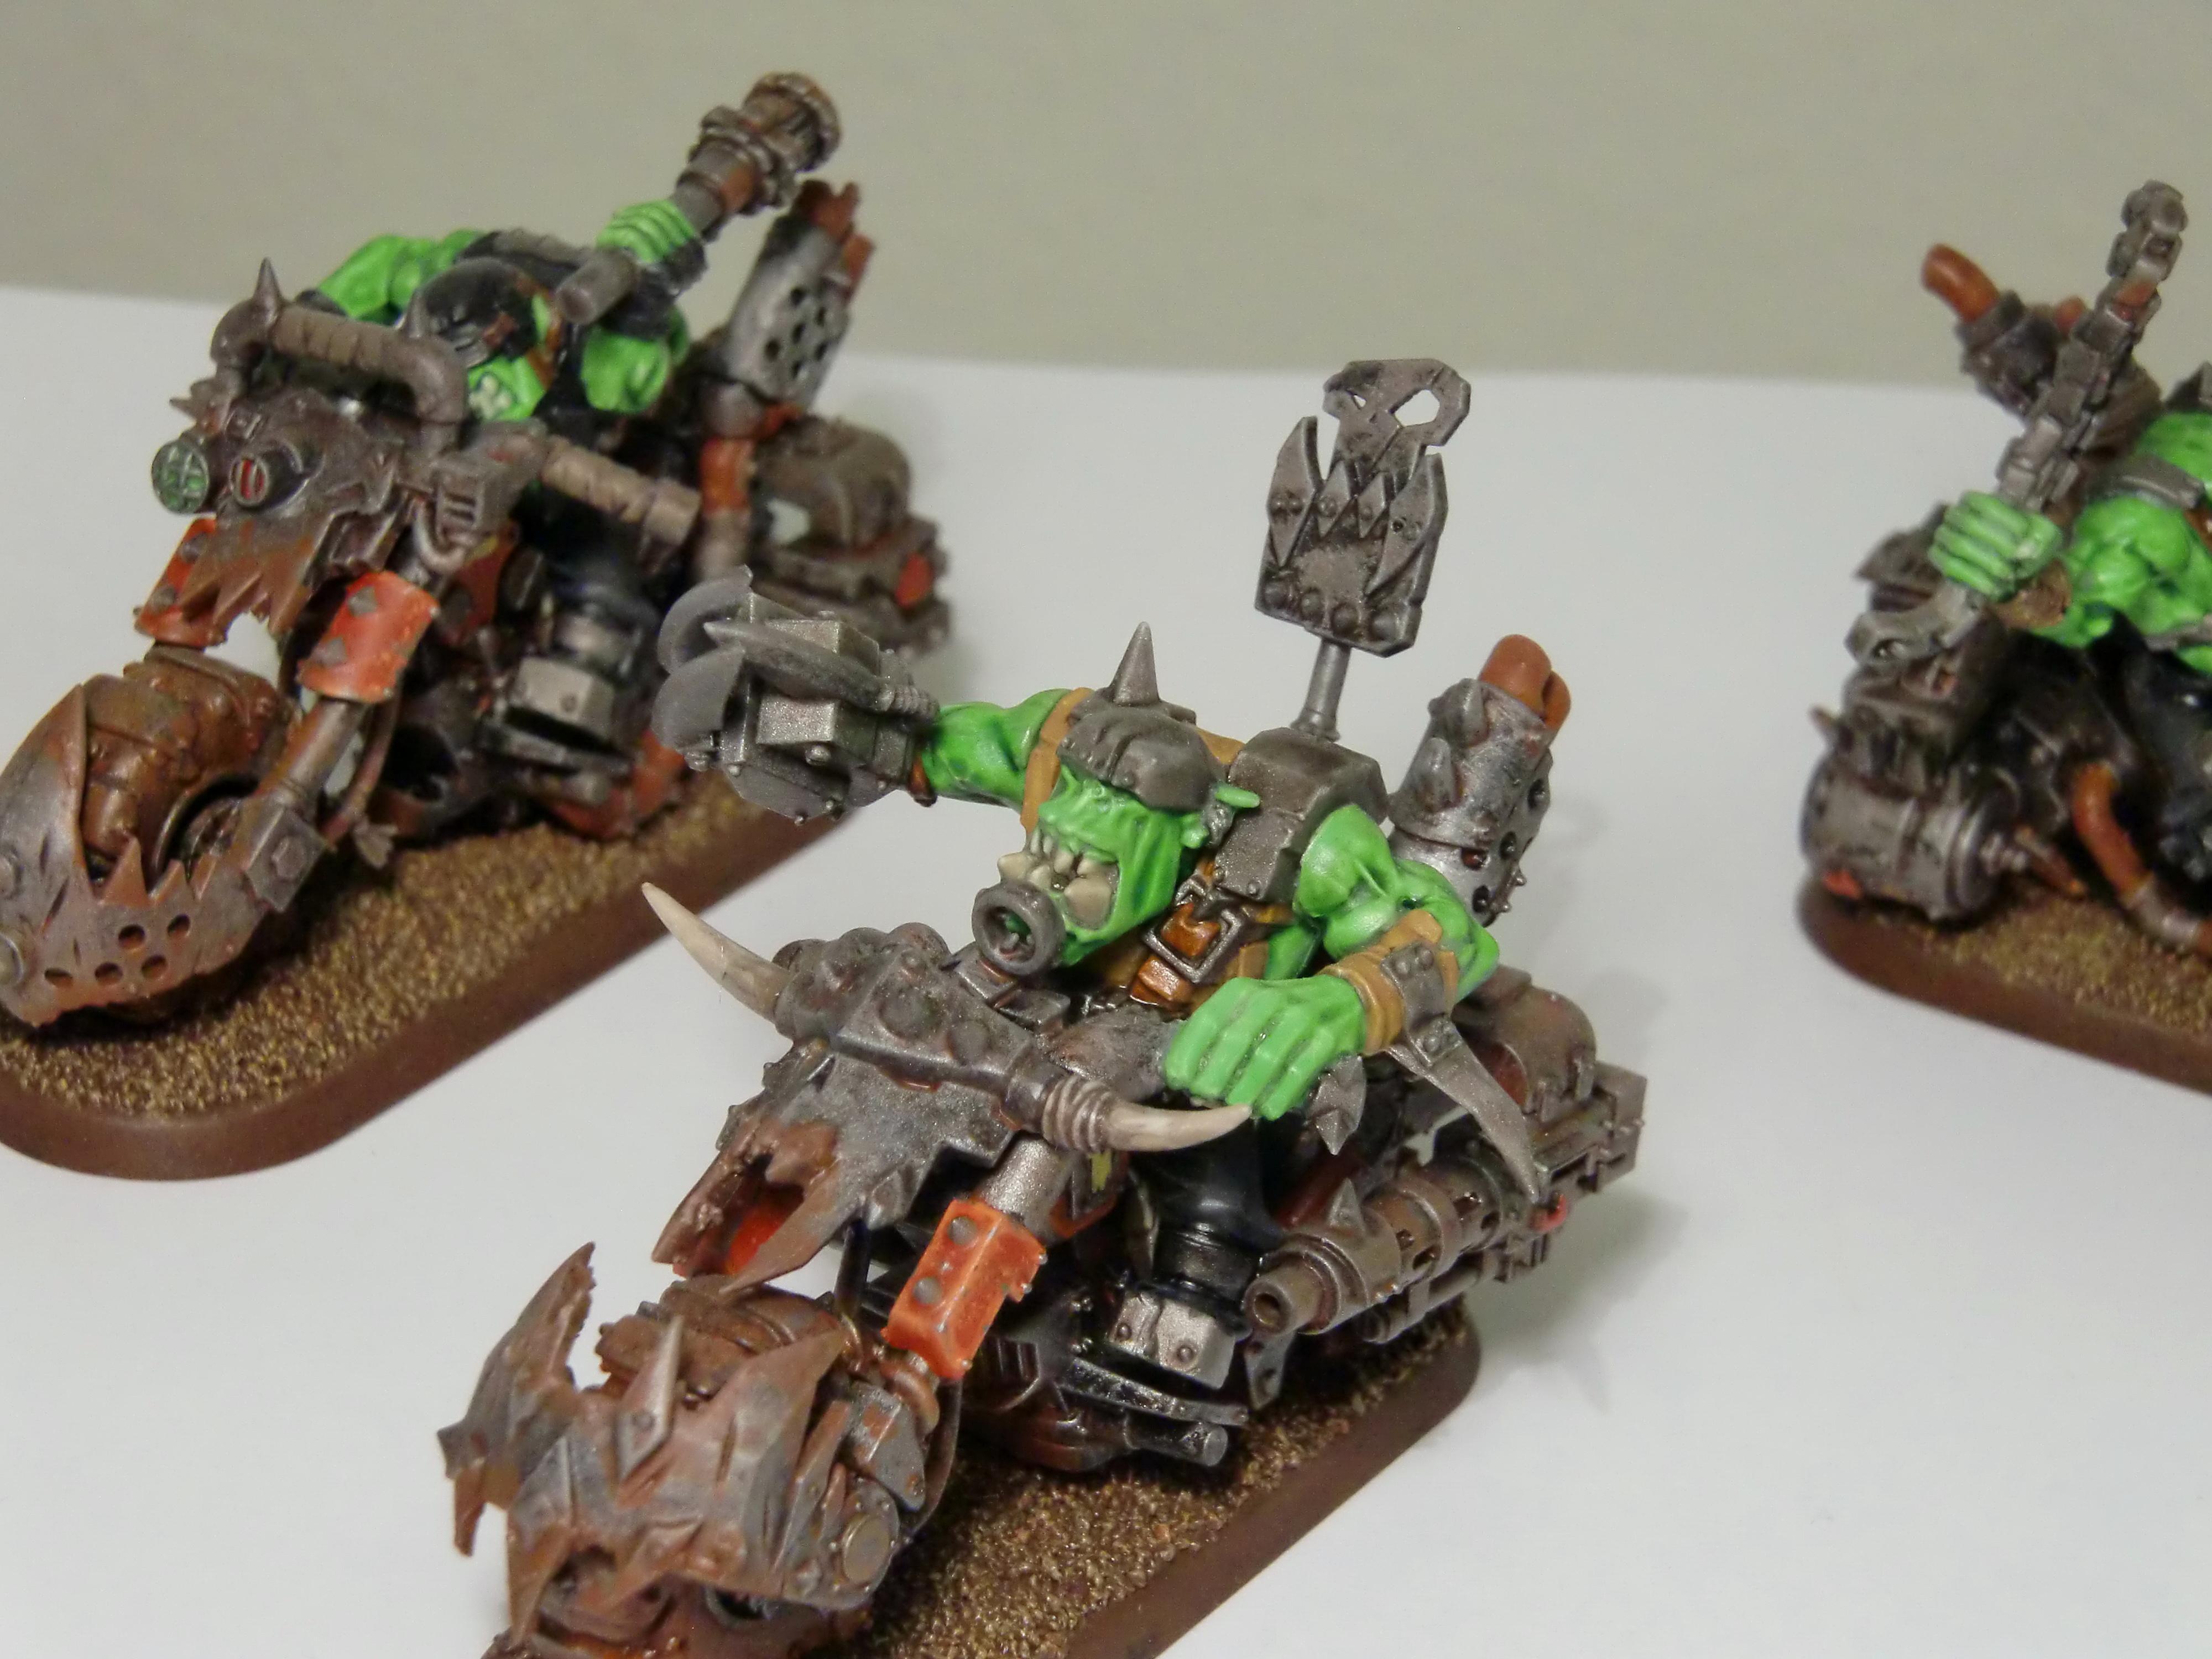 Bike, Magnet, Okrs, Space Orks